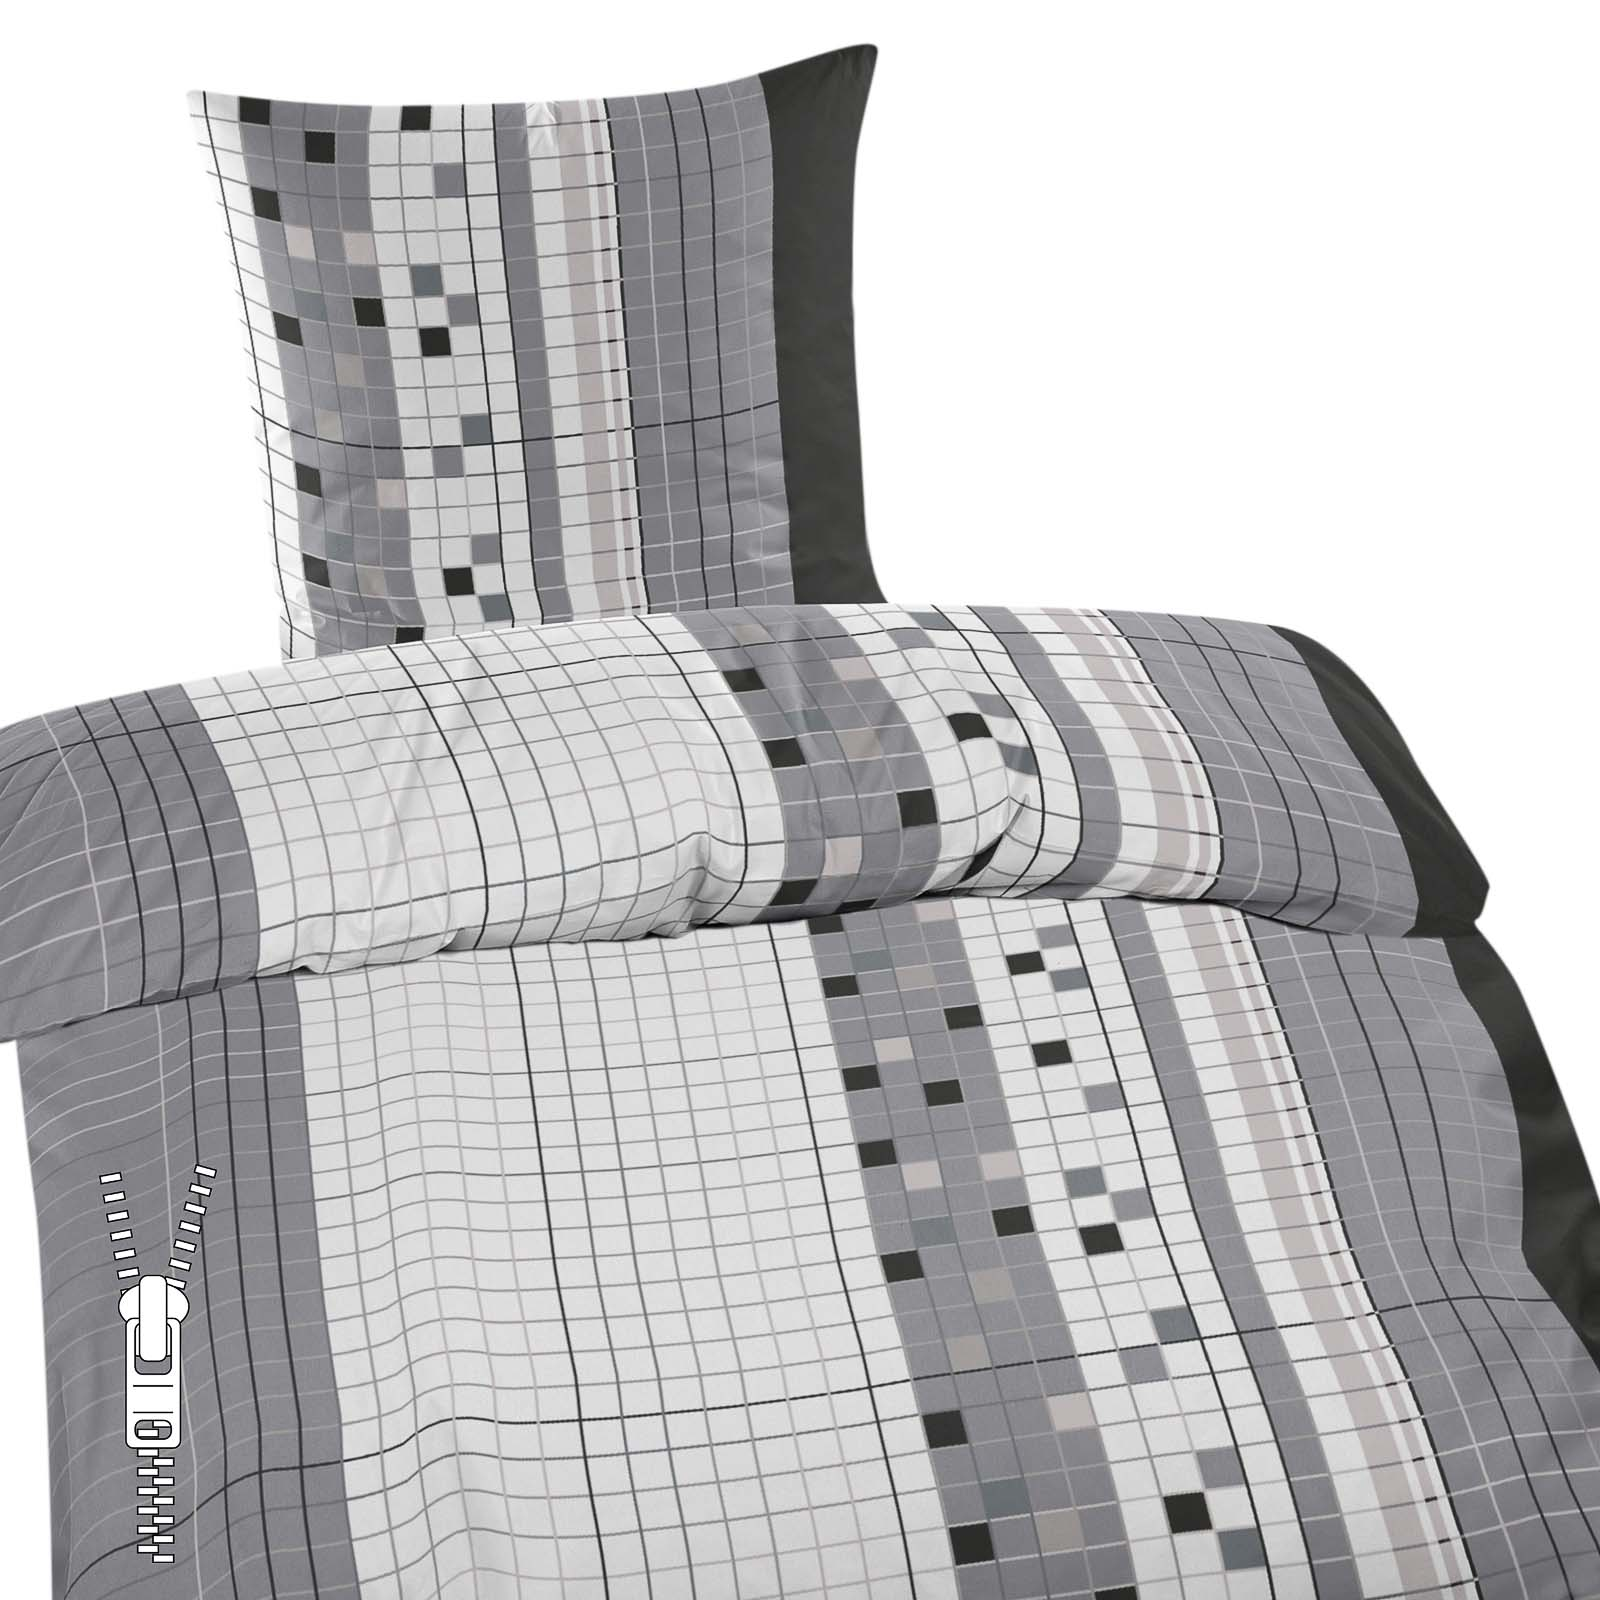 feinbiber bettw sche 135x200cm 80x80cm in verschiedene. Black Bedroom Furniture Sets. Home Design Ideas